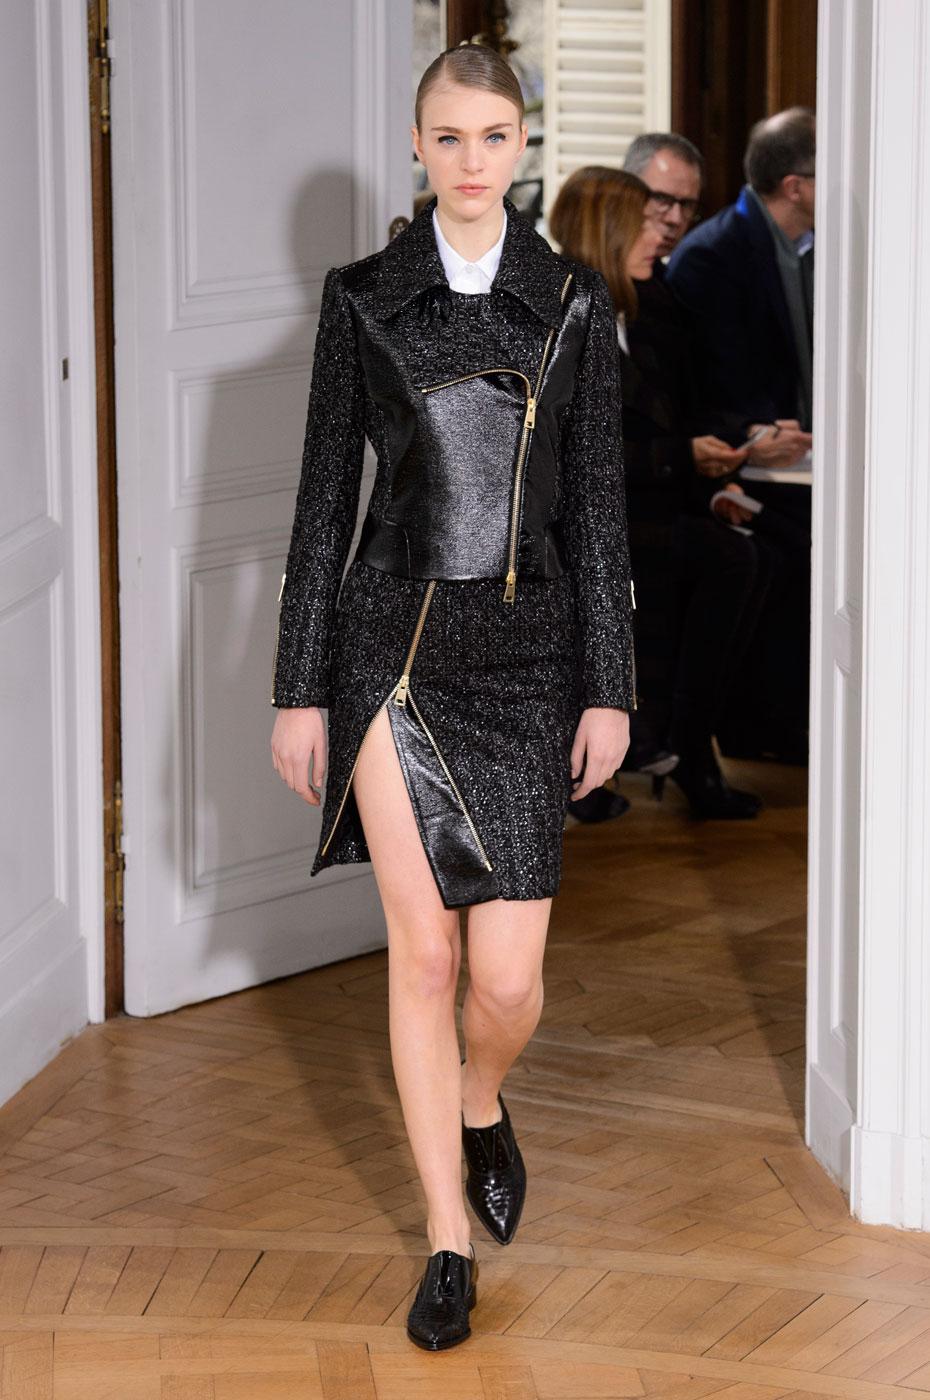 Bouchra-Jarrar-fashion-runway-show-haute-couture-paris-spring-summer-2015-the-impression-27